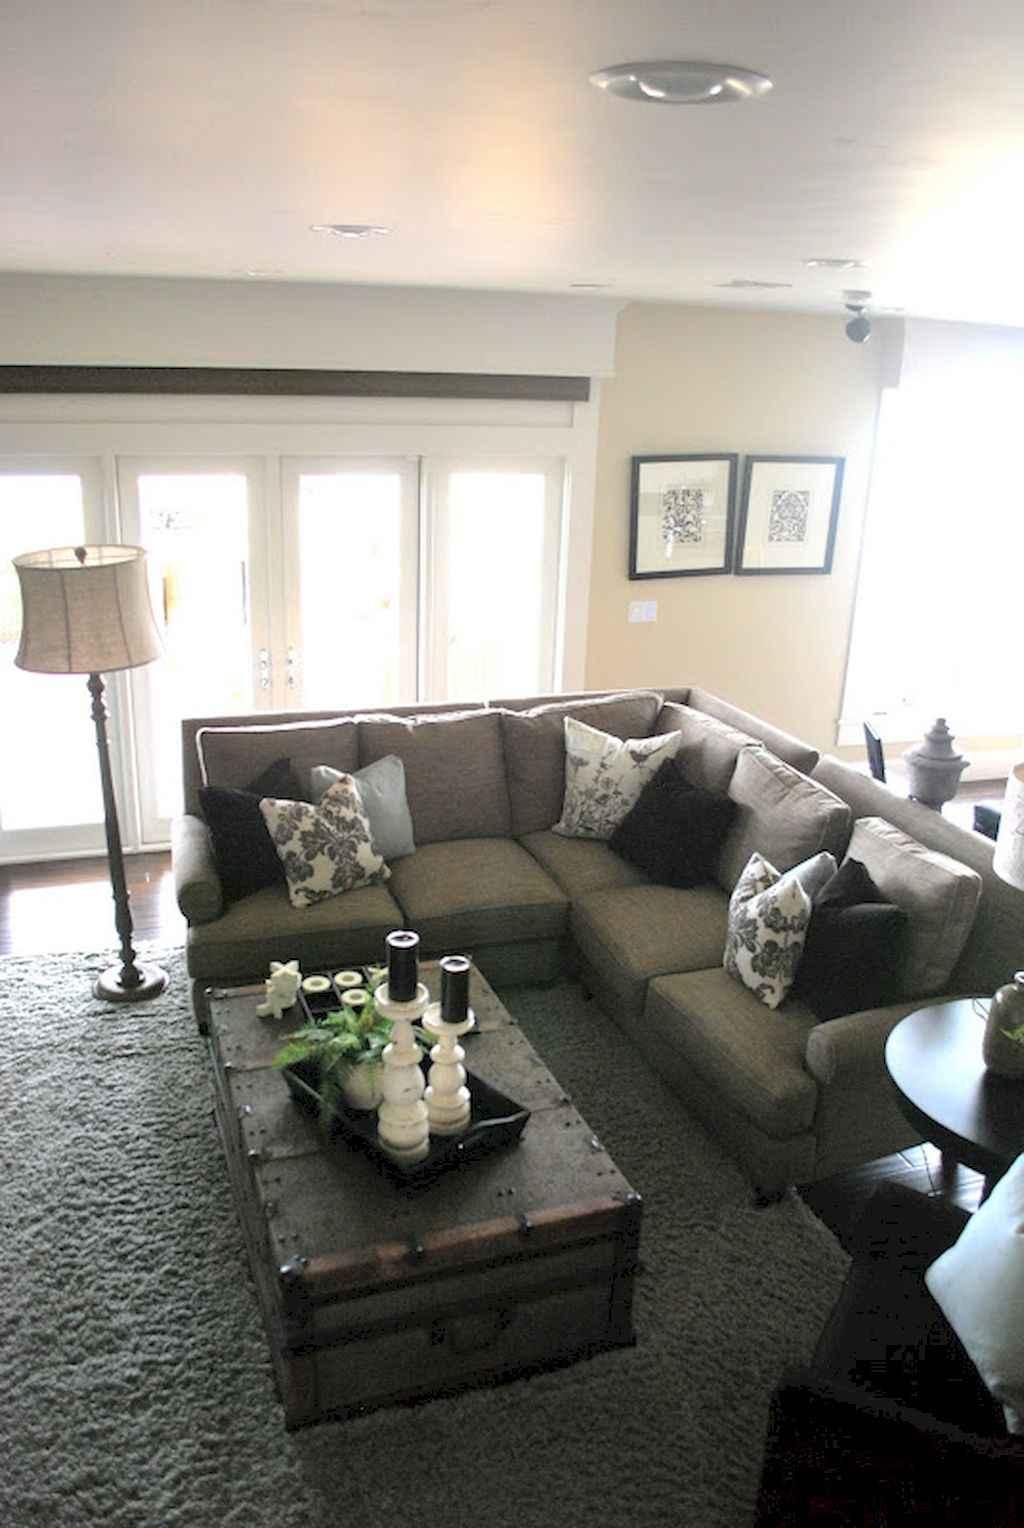 Simple clean vintage living room decorating ideas (30)